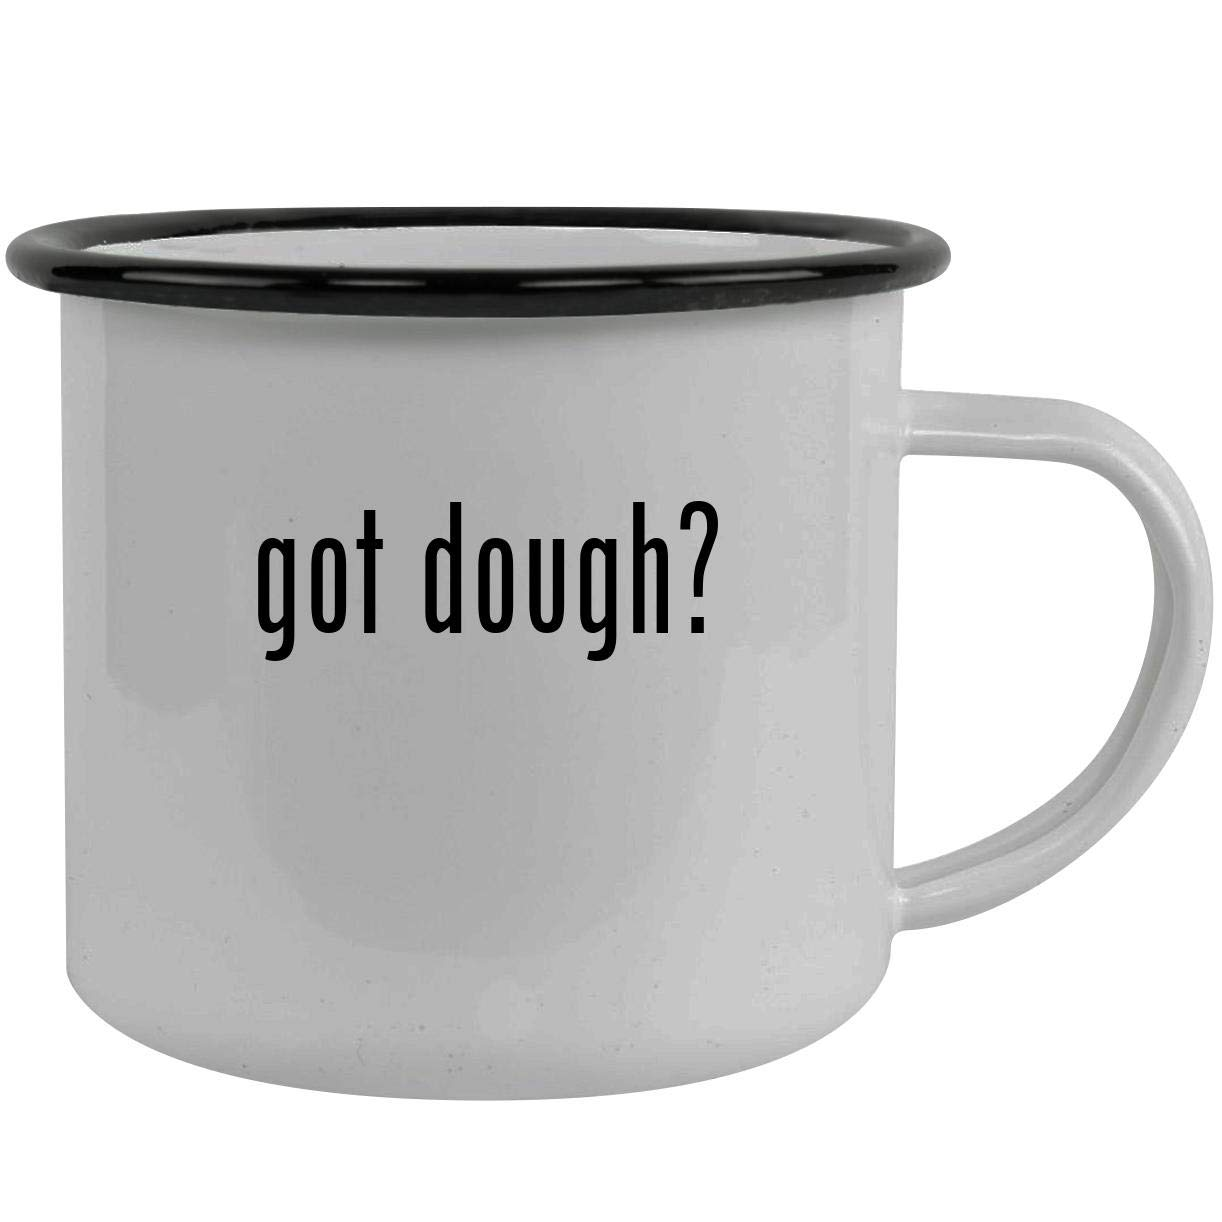 got dough? - Stainless Steel 12oz Camping Mug, Black